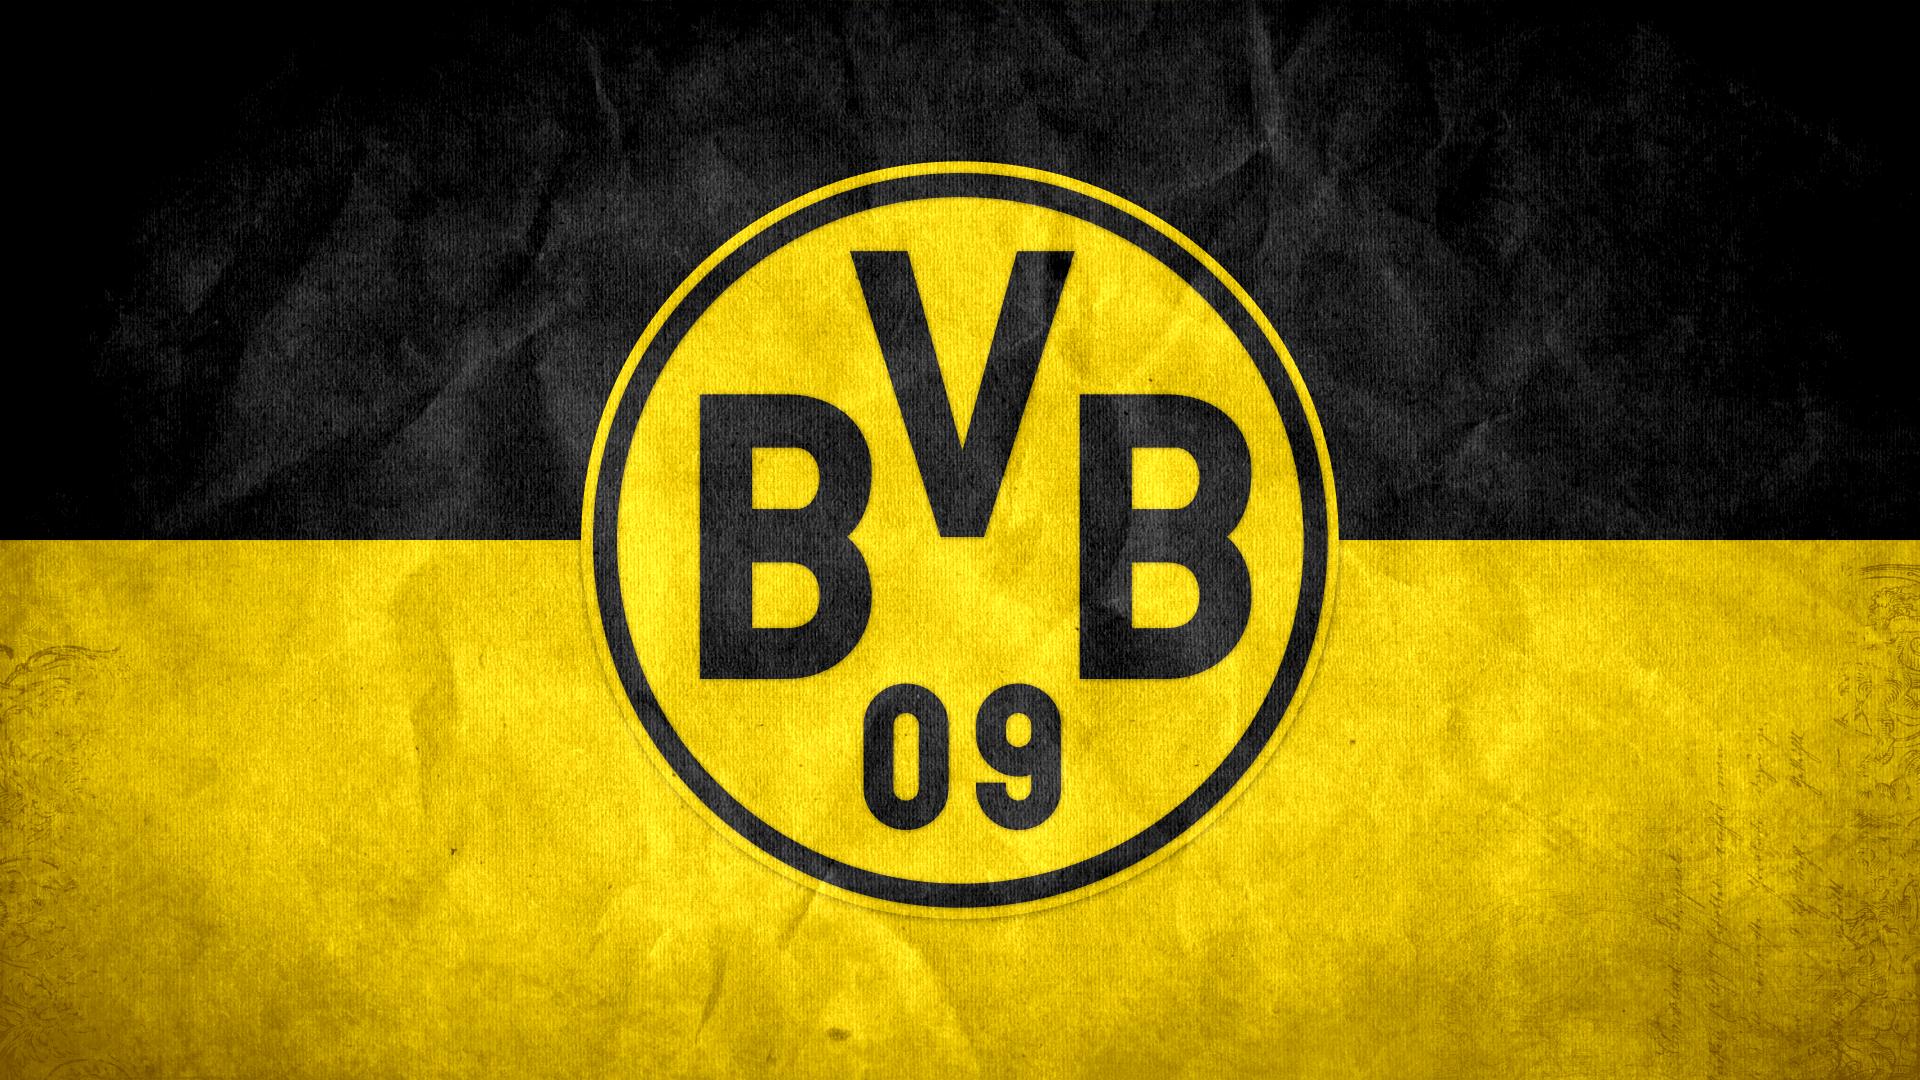 Borussia Dortmund Hd Wallpaper Background Image 1920x1080 Id 1024985 Wallpaper Abyss